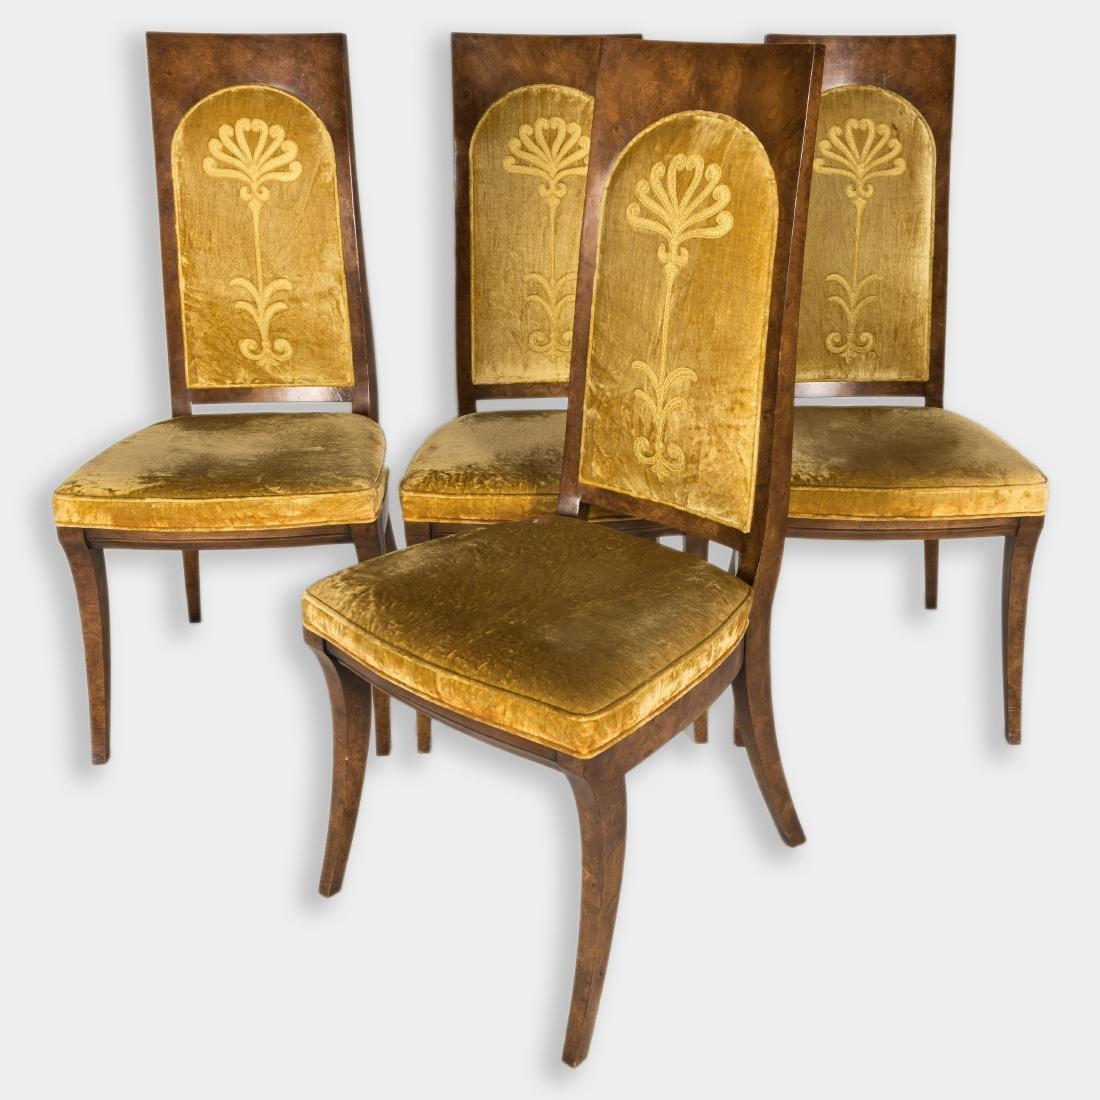 Four Mastercraft Burl Dining Chairs